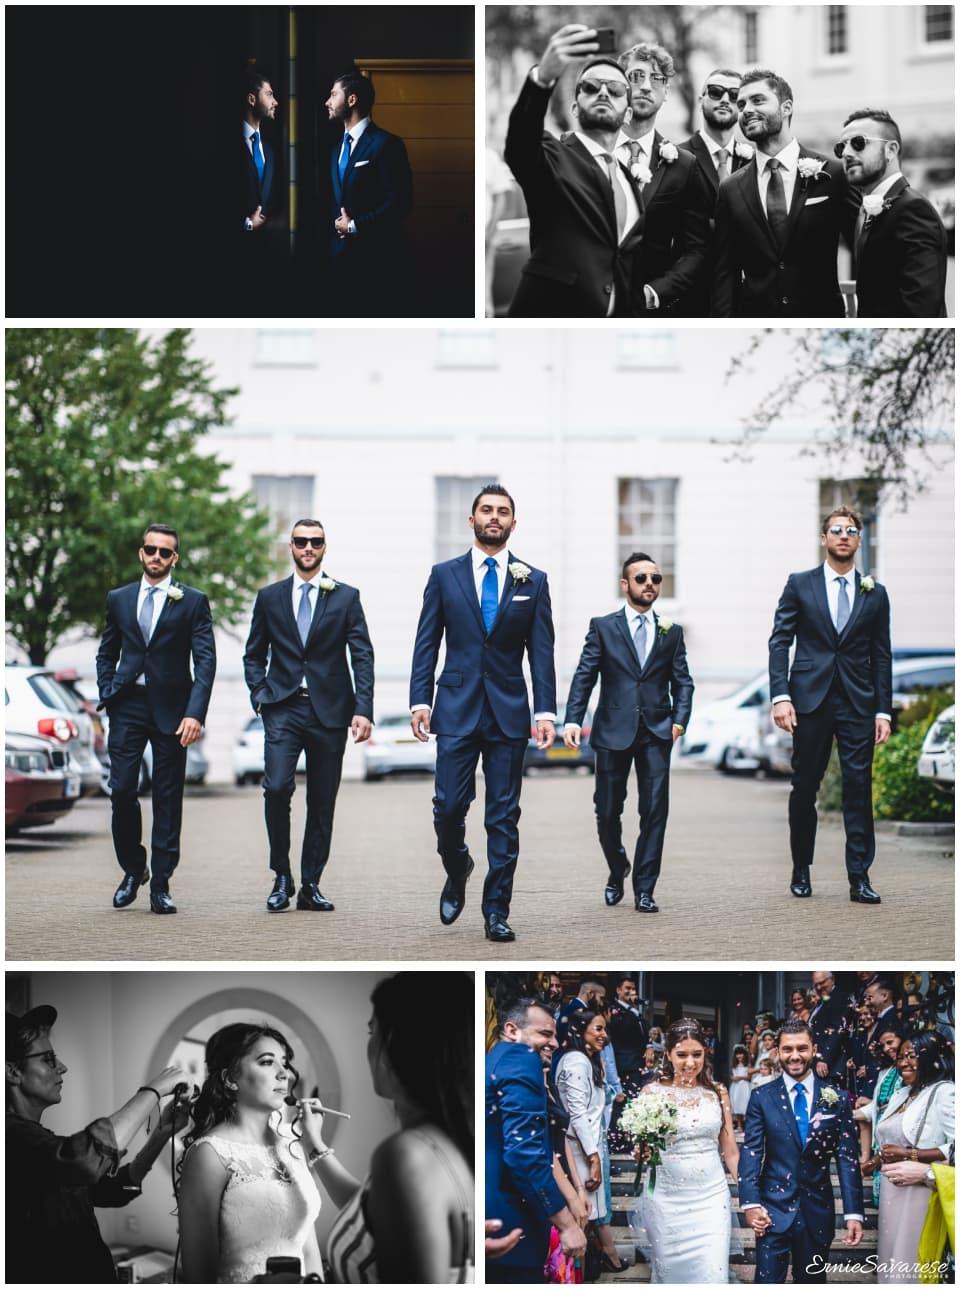 Wedding Photographer London Ernie Savarese Wedding Gallery